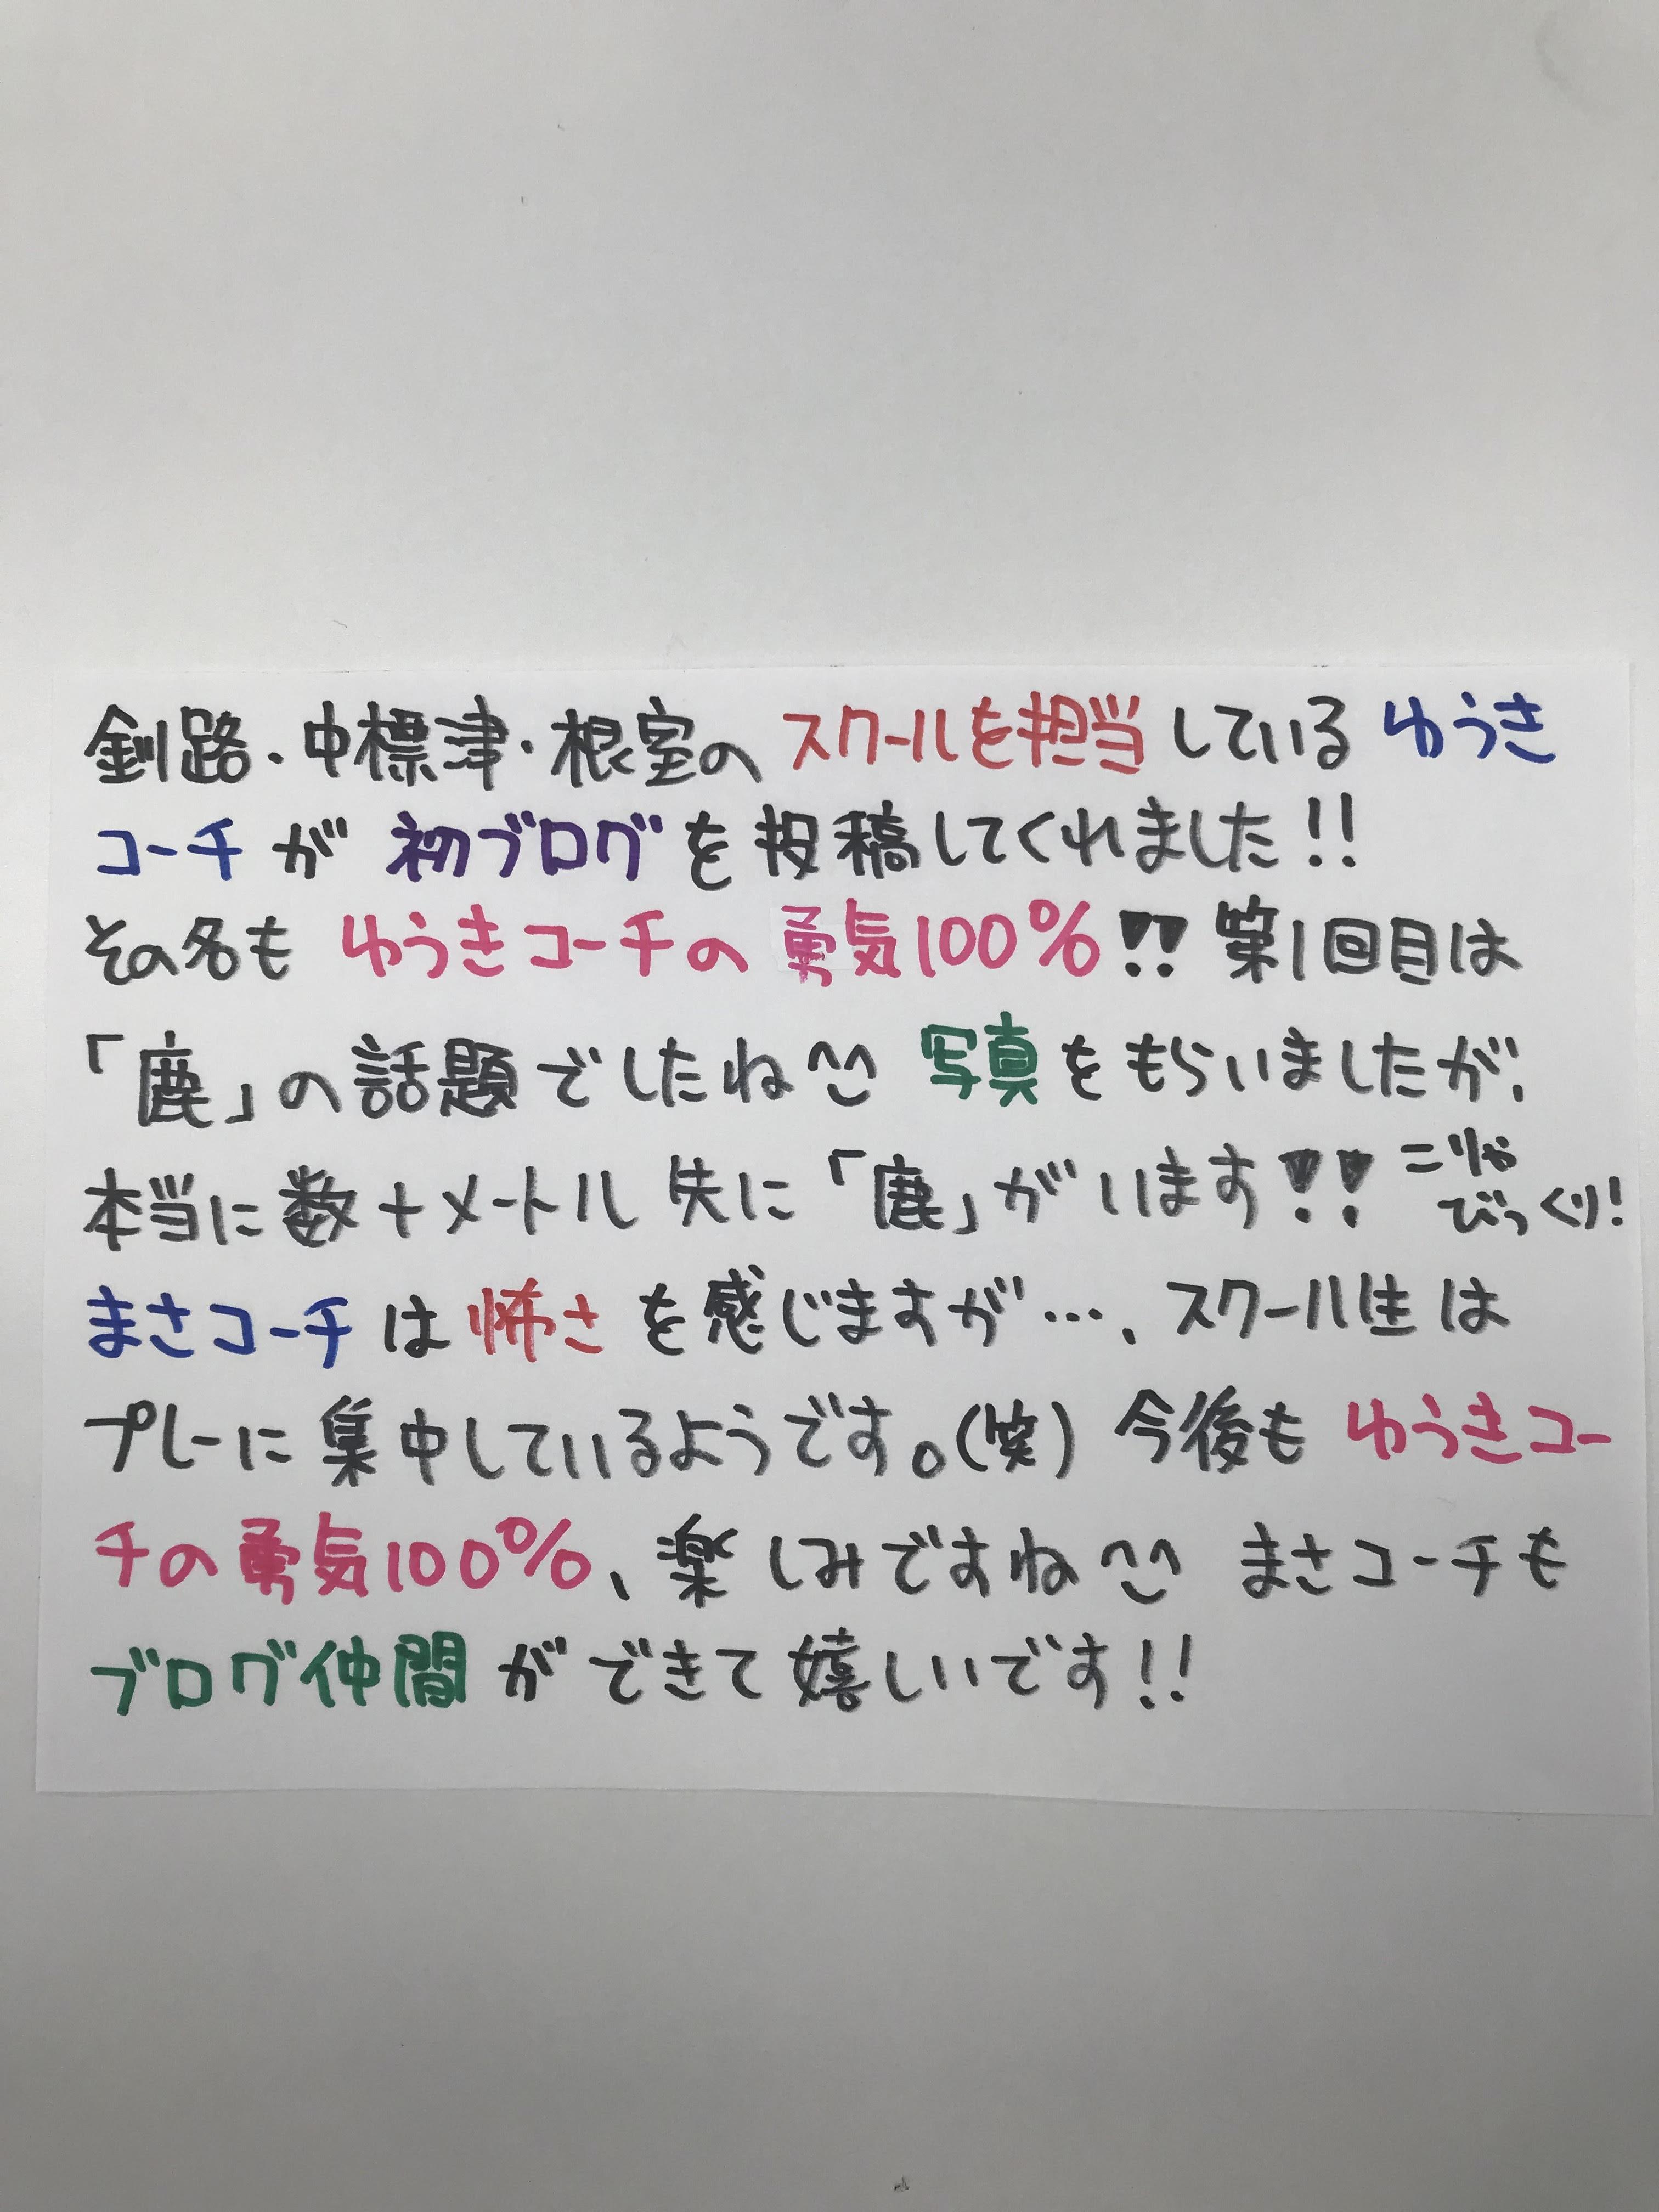 https://chsc.jp/news/up_images/%2331%288%29.jpg